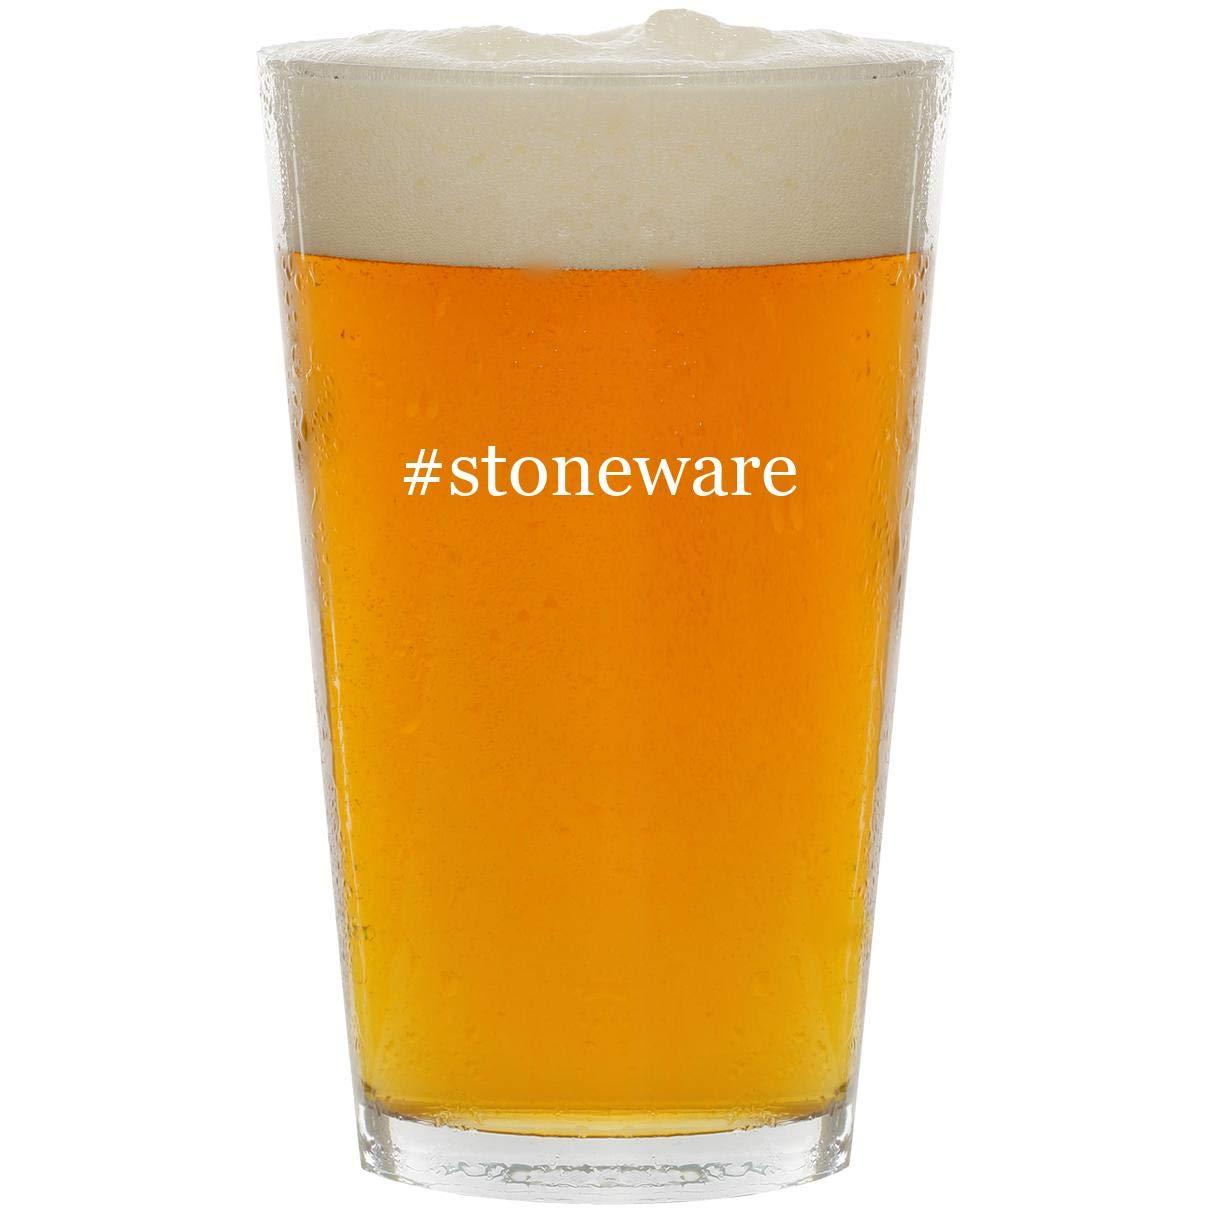 #stoneware - Glass Hashtag 16oz Beer Pint